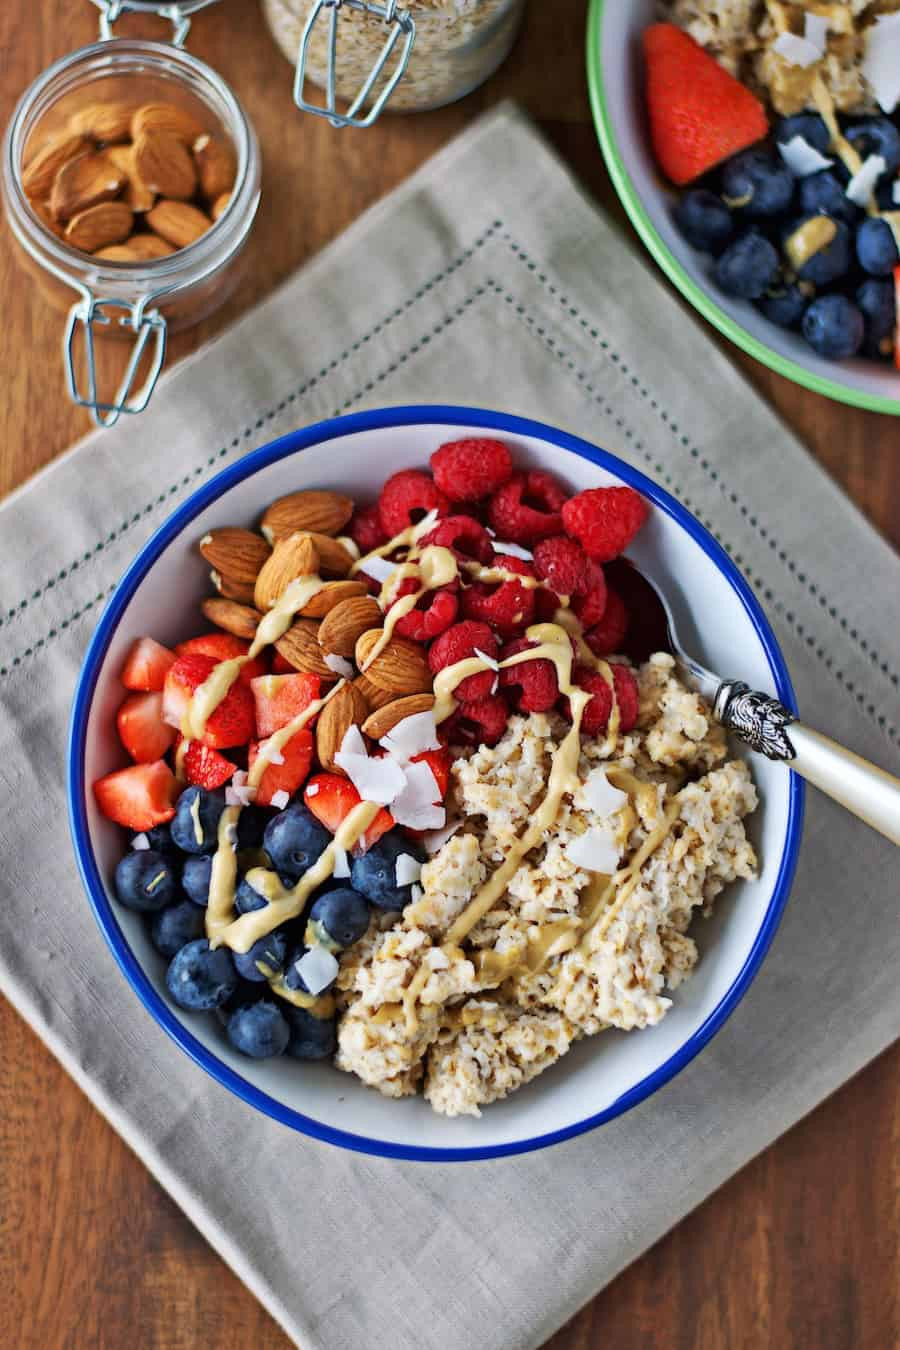 Vegan Breakfast Videos  25 Brilliant Vegan Breakfast Recipes To Brighten Up Your